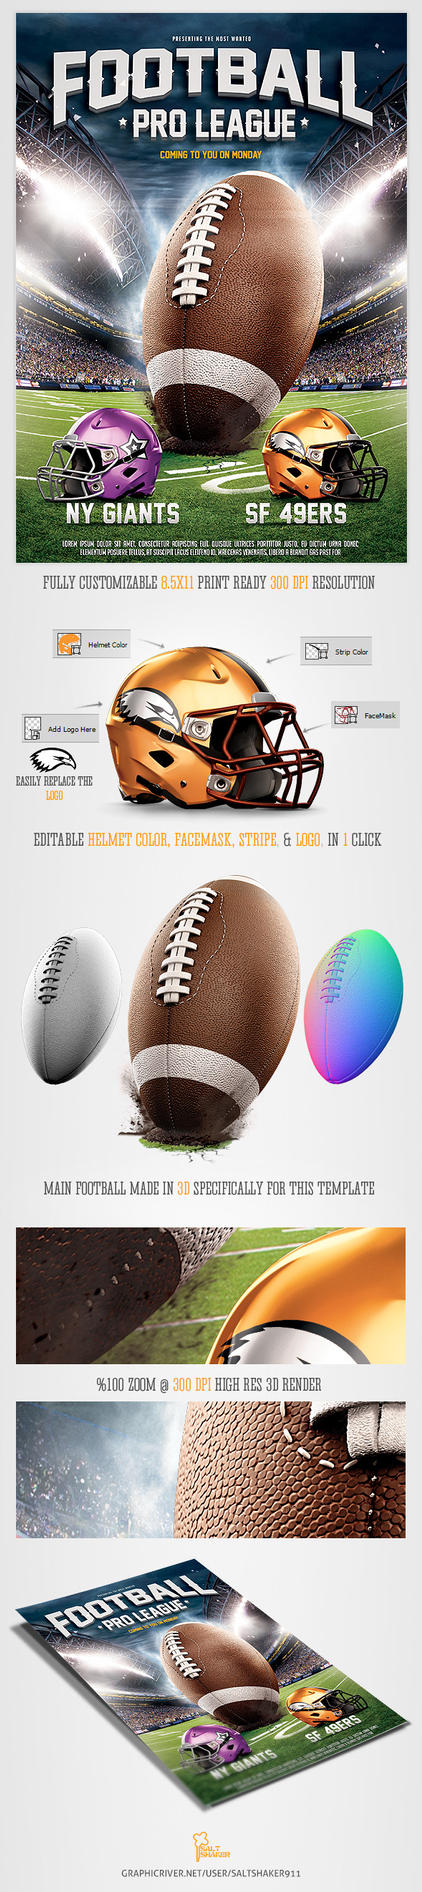 American Football League Flyer Template by saltshaker911